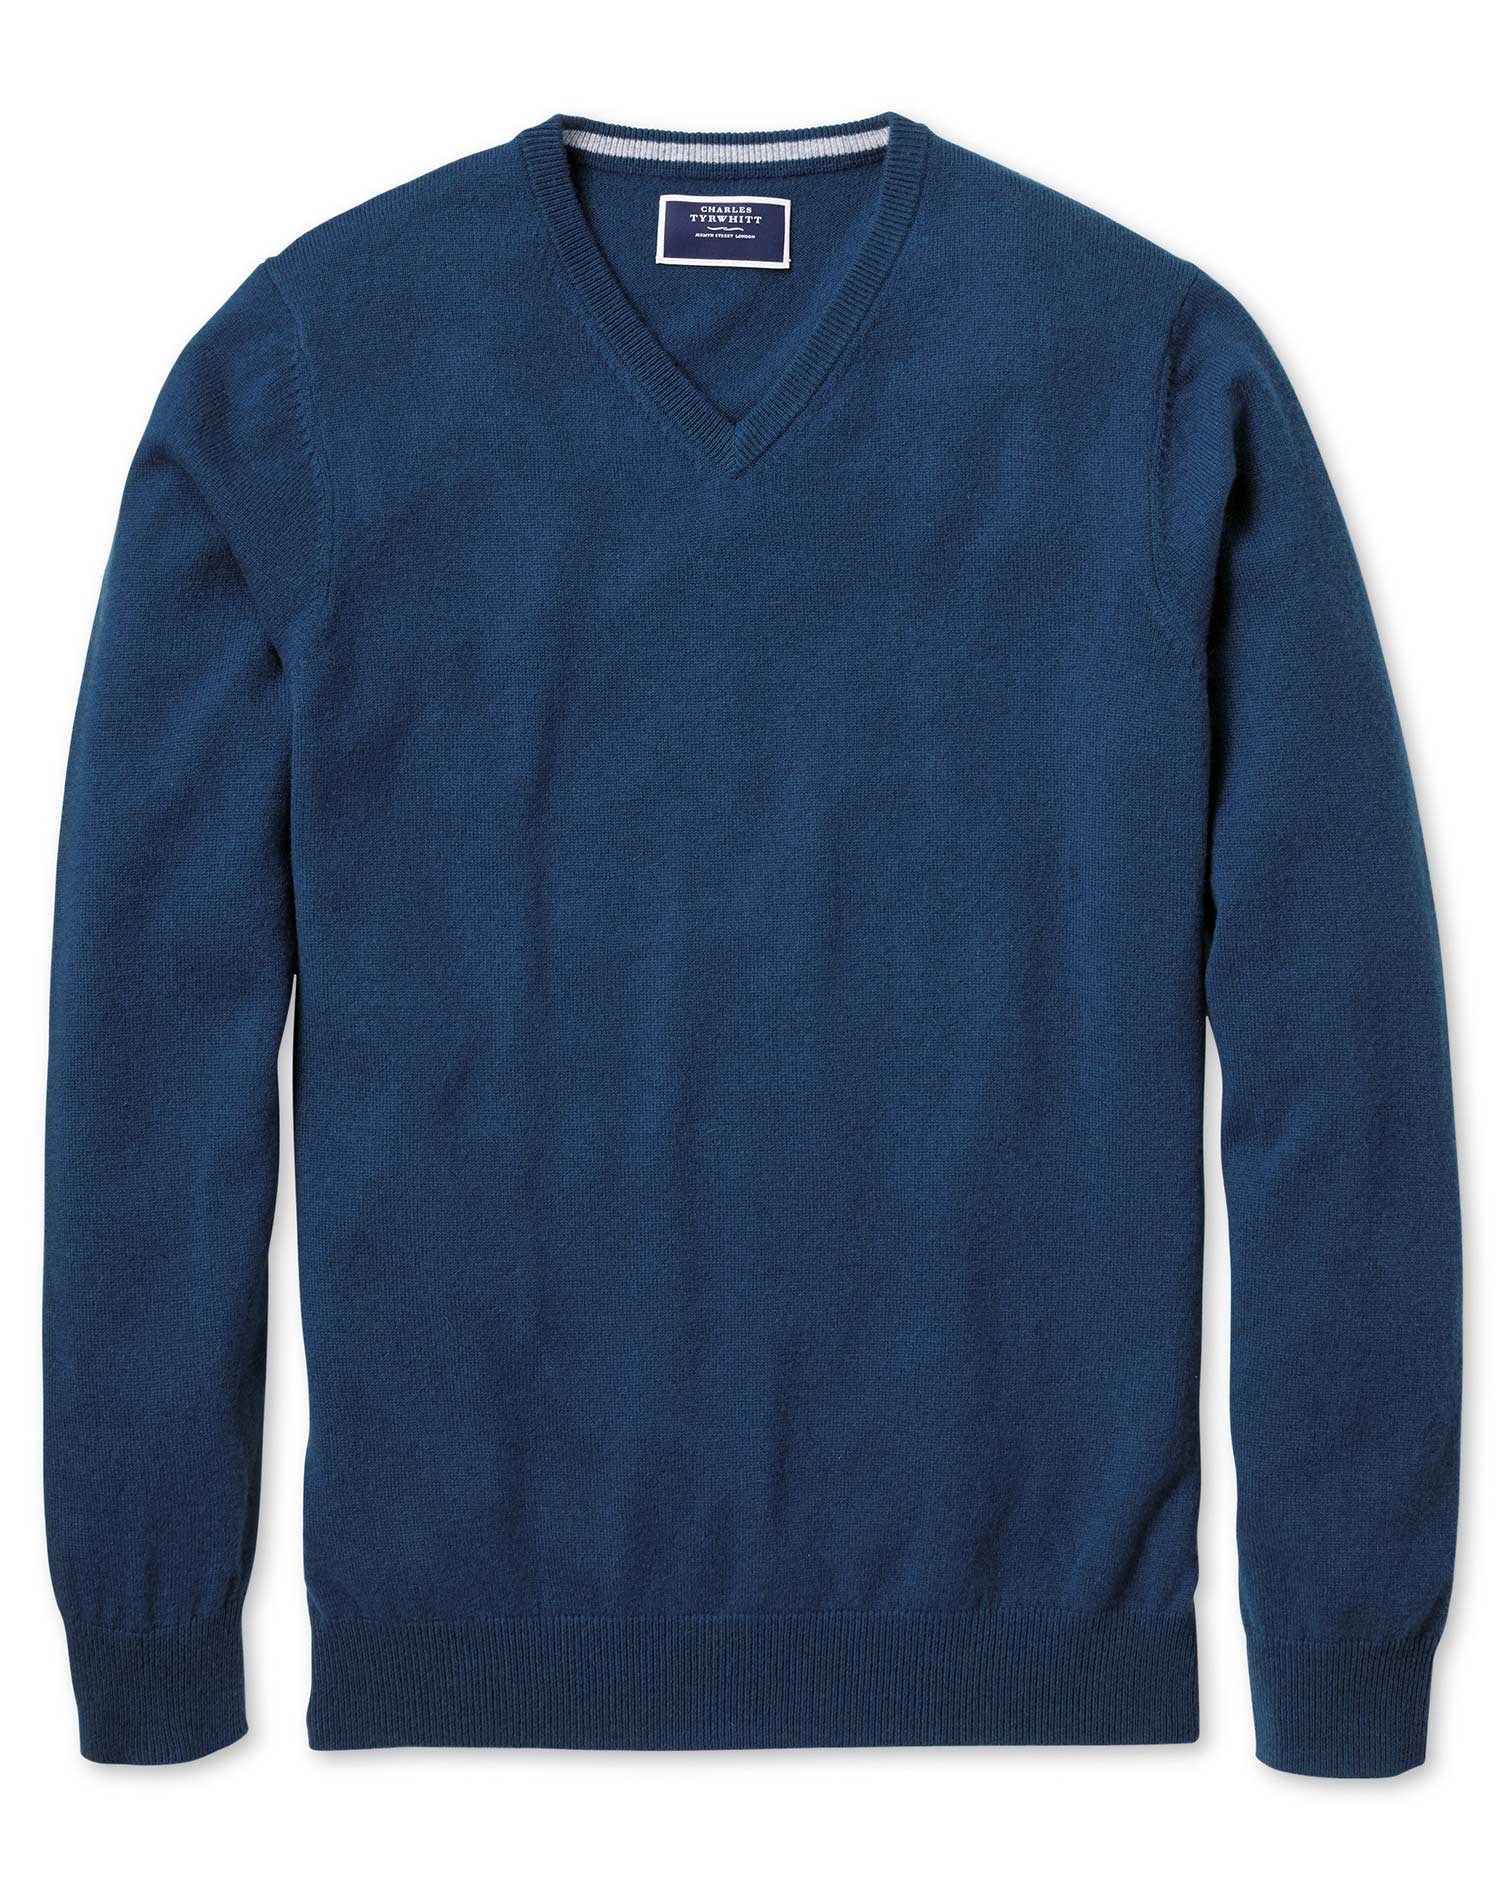 Blue V-Neck Cashmere Sweater Size Medium by Charles Tyrwhitt